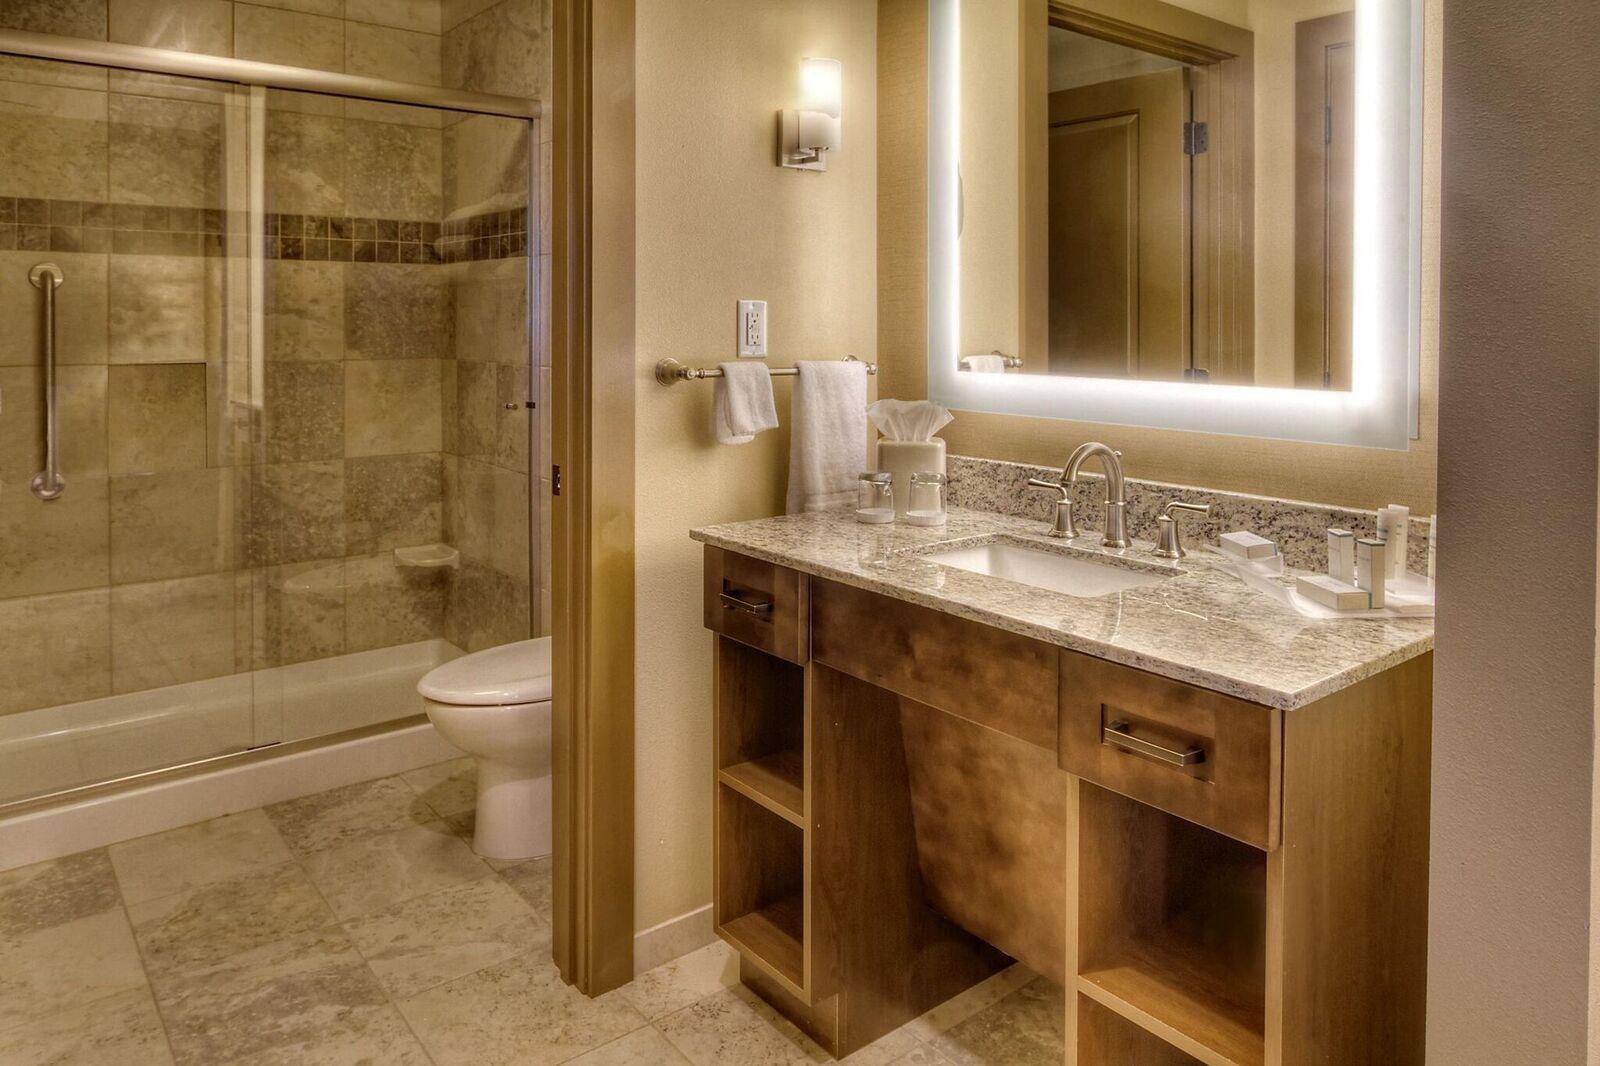 Hotel Bathroom from Erck Hotels